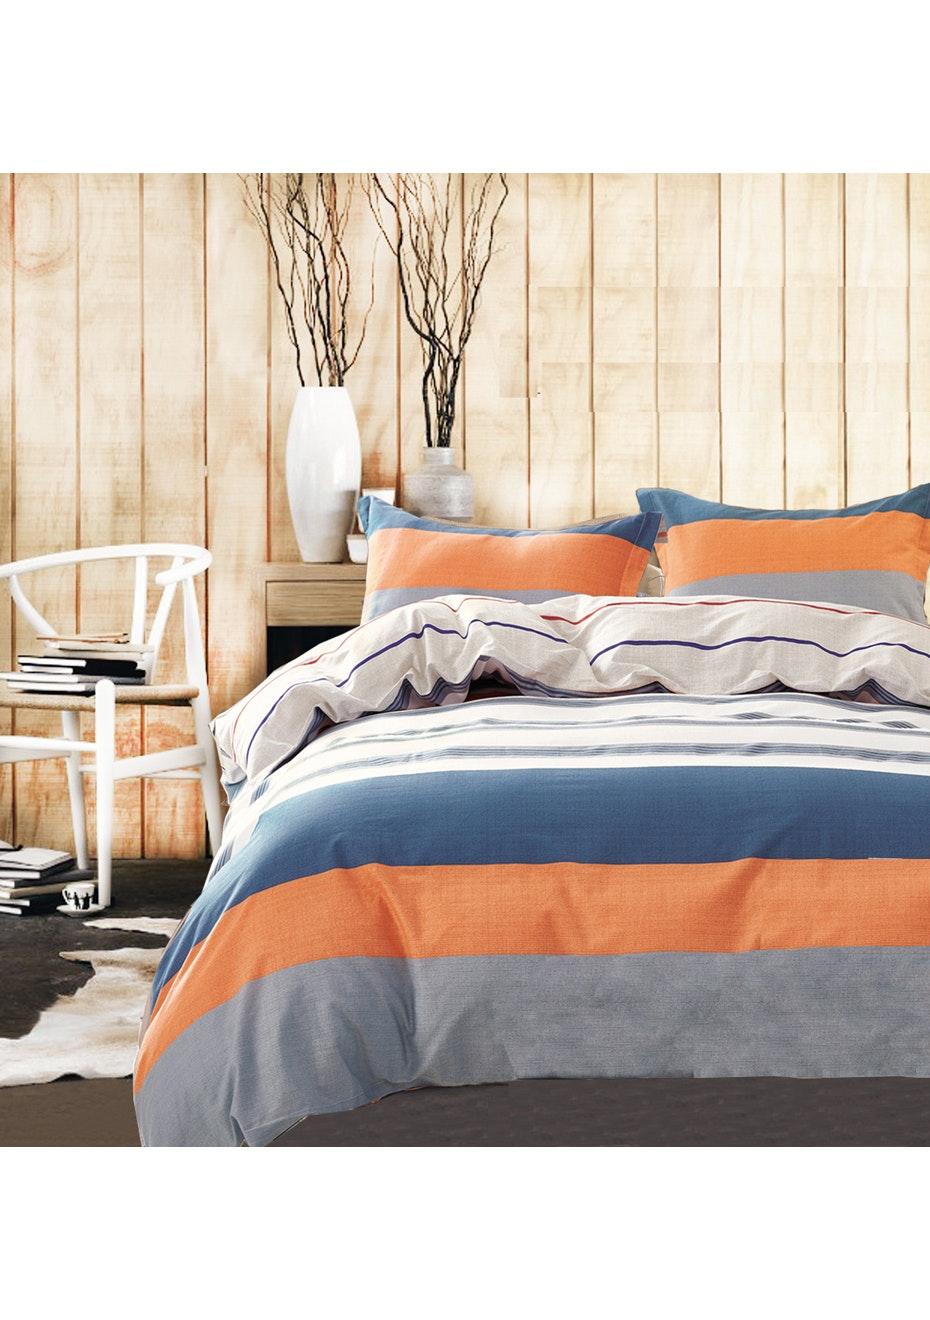 Nelson Bay Quilt Cover Set - Reversible Design - 100% Cotton - Queen Bed